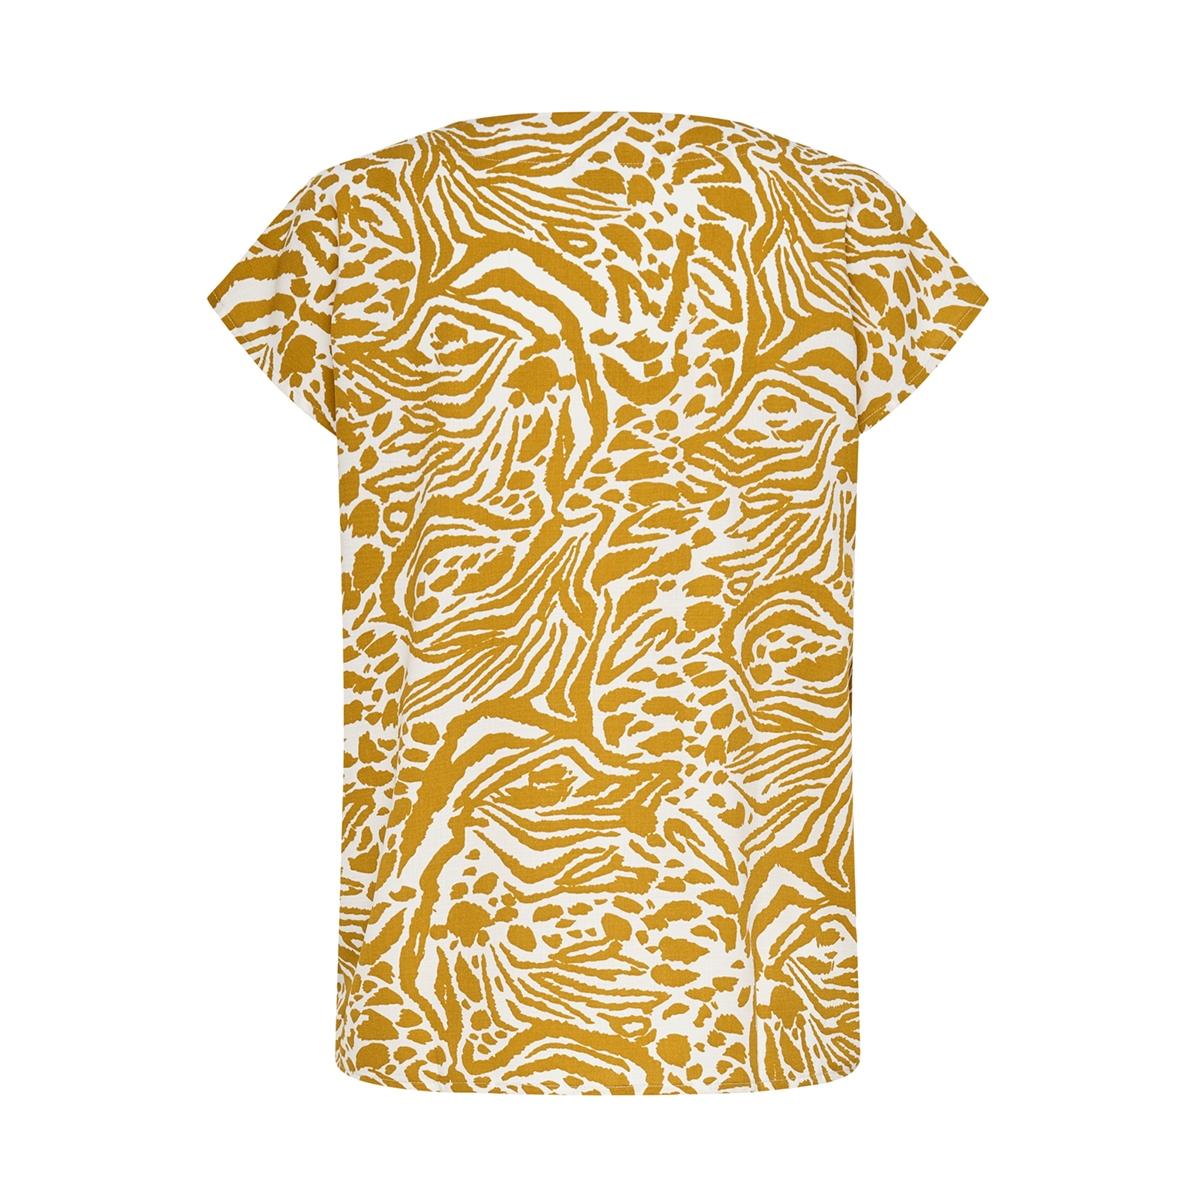 jdylion ss v-neck top wvn 15207812 jacqueline de yong t-shirt cement/animal